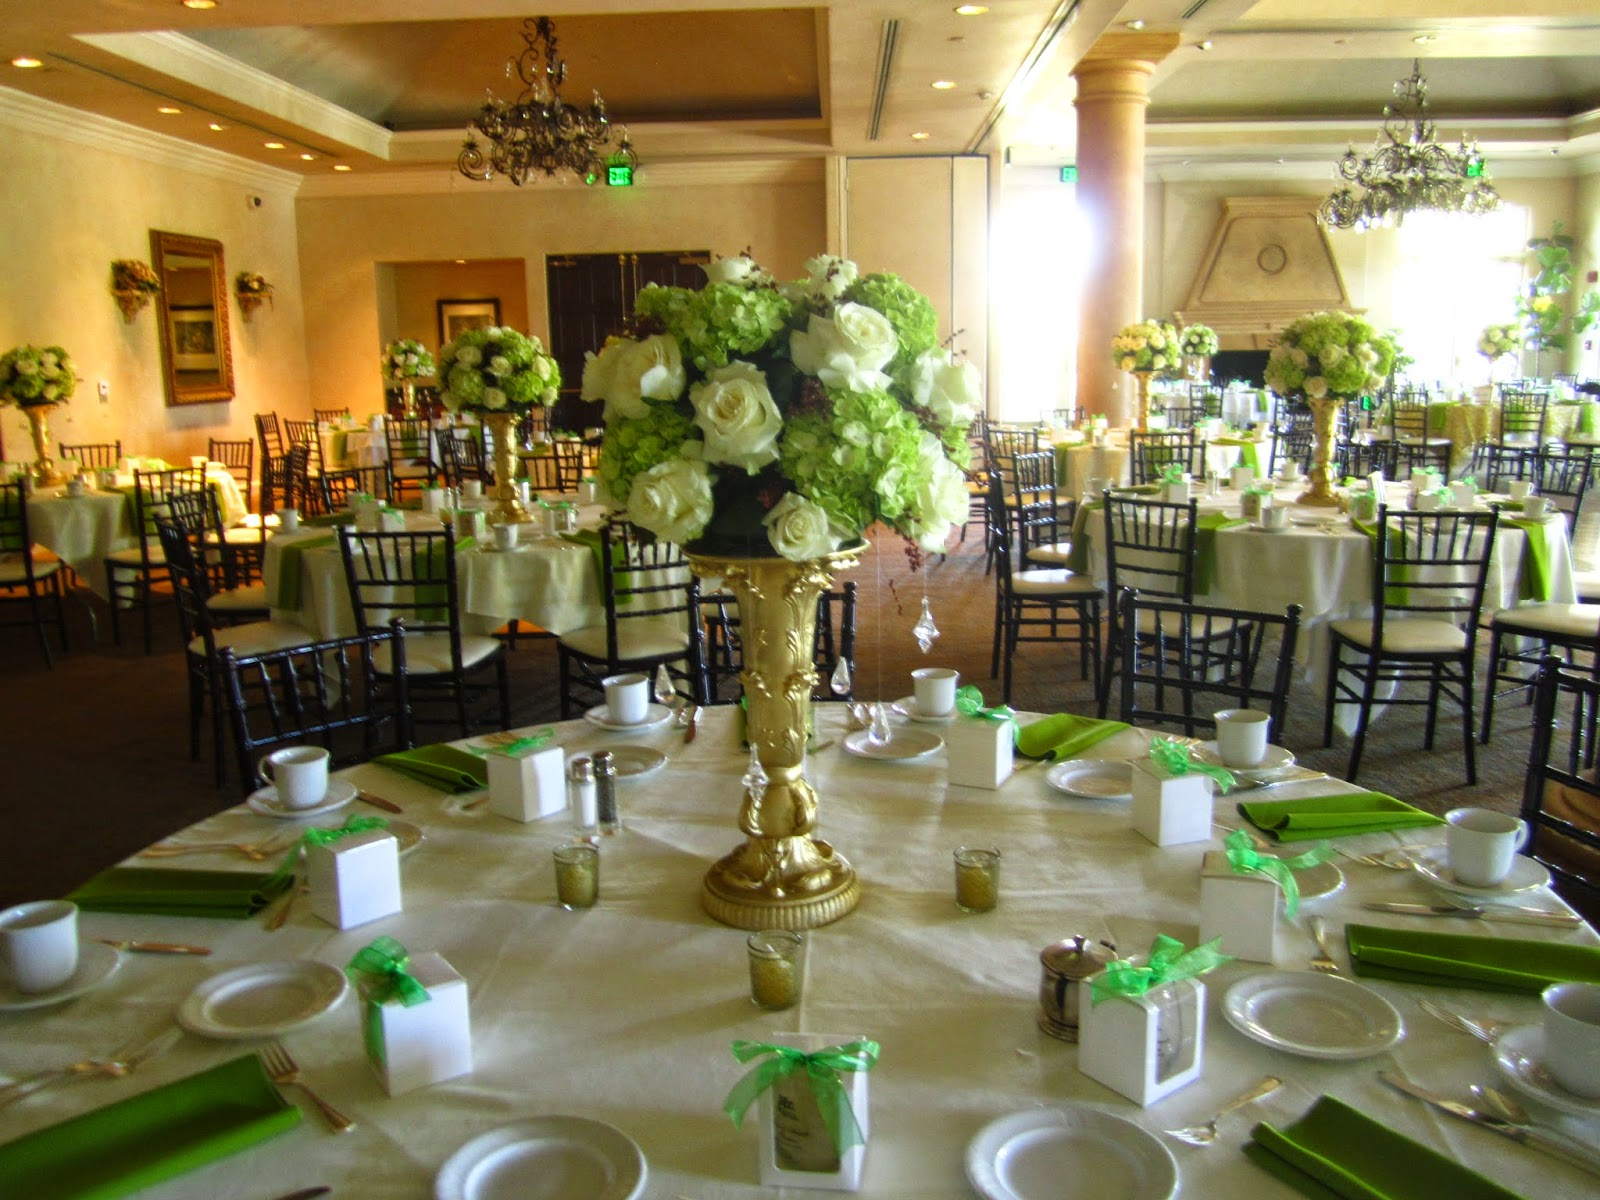 Wedding Centerpieces Spanish Hills Country Club Camarillo Ca